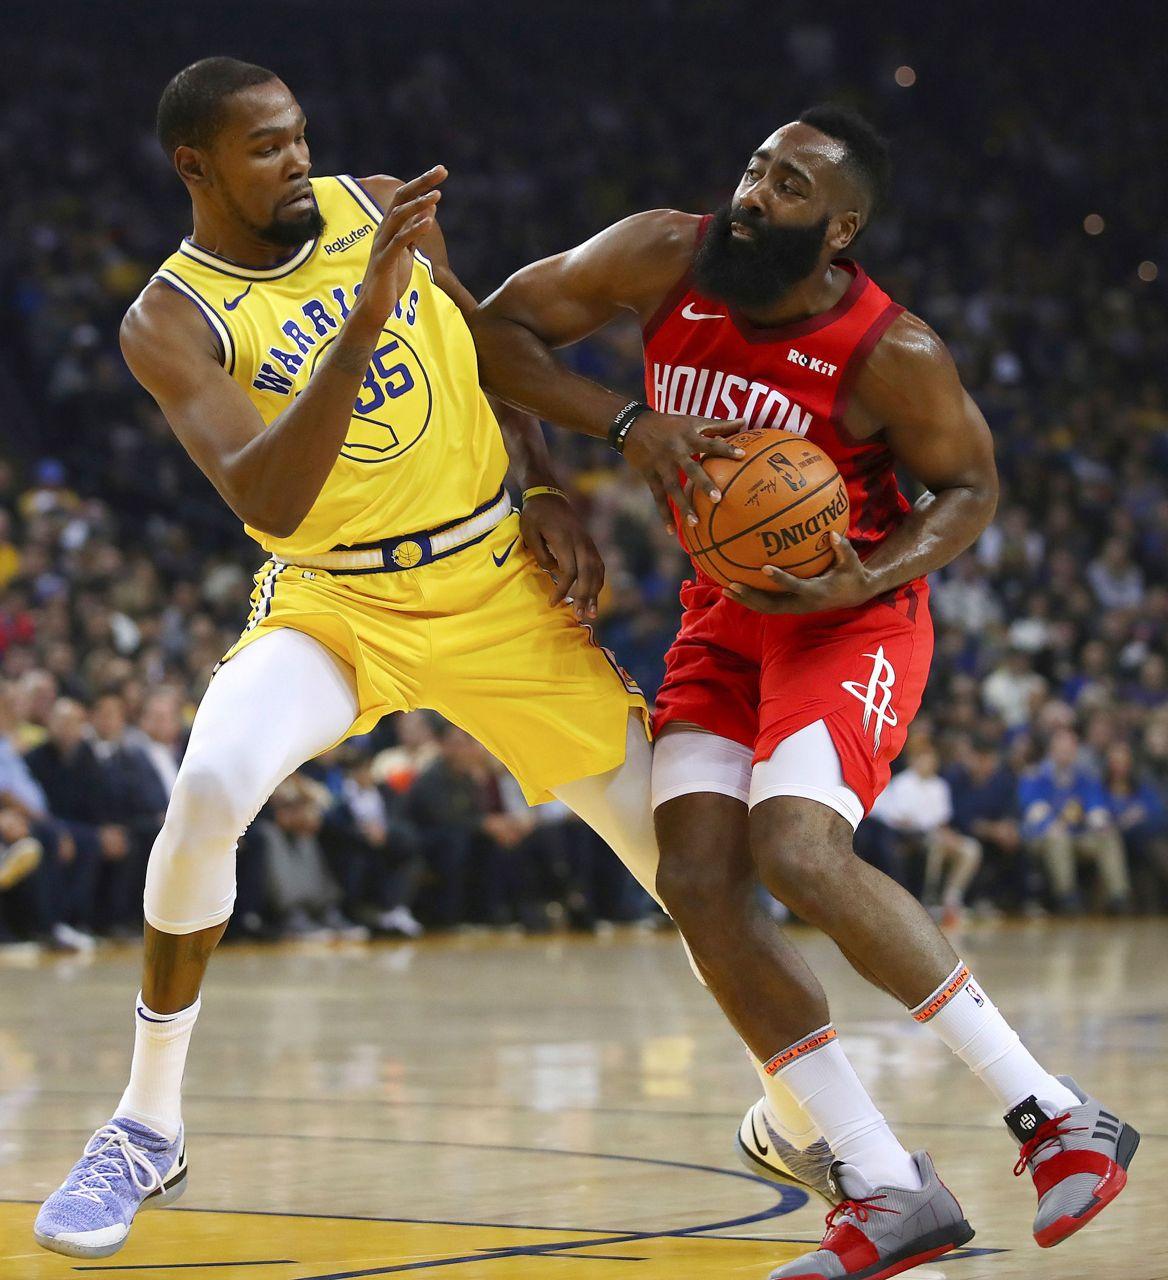 Houston Rockets Squad 2019: James Harden Rallies Rockets In OT To Beat Warriors 135-134